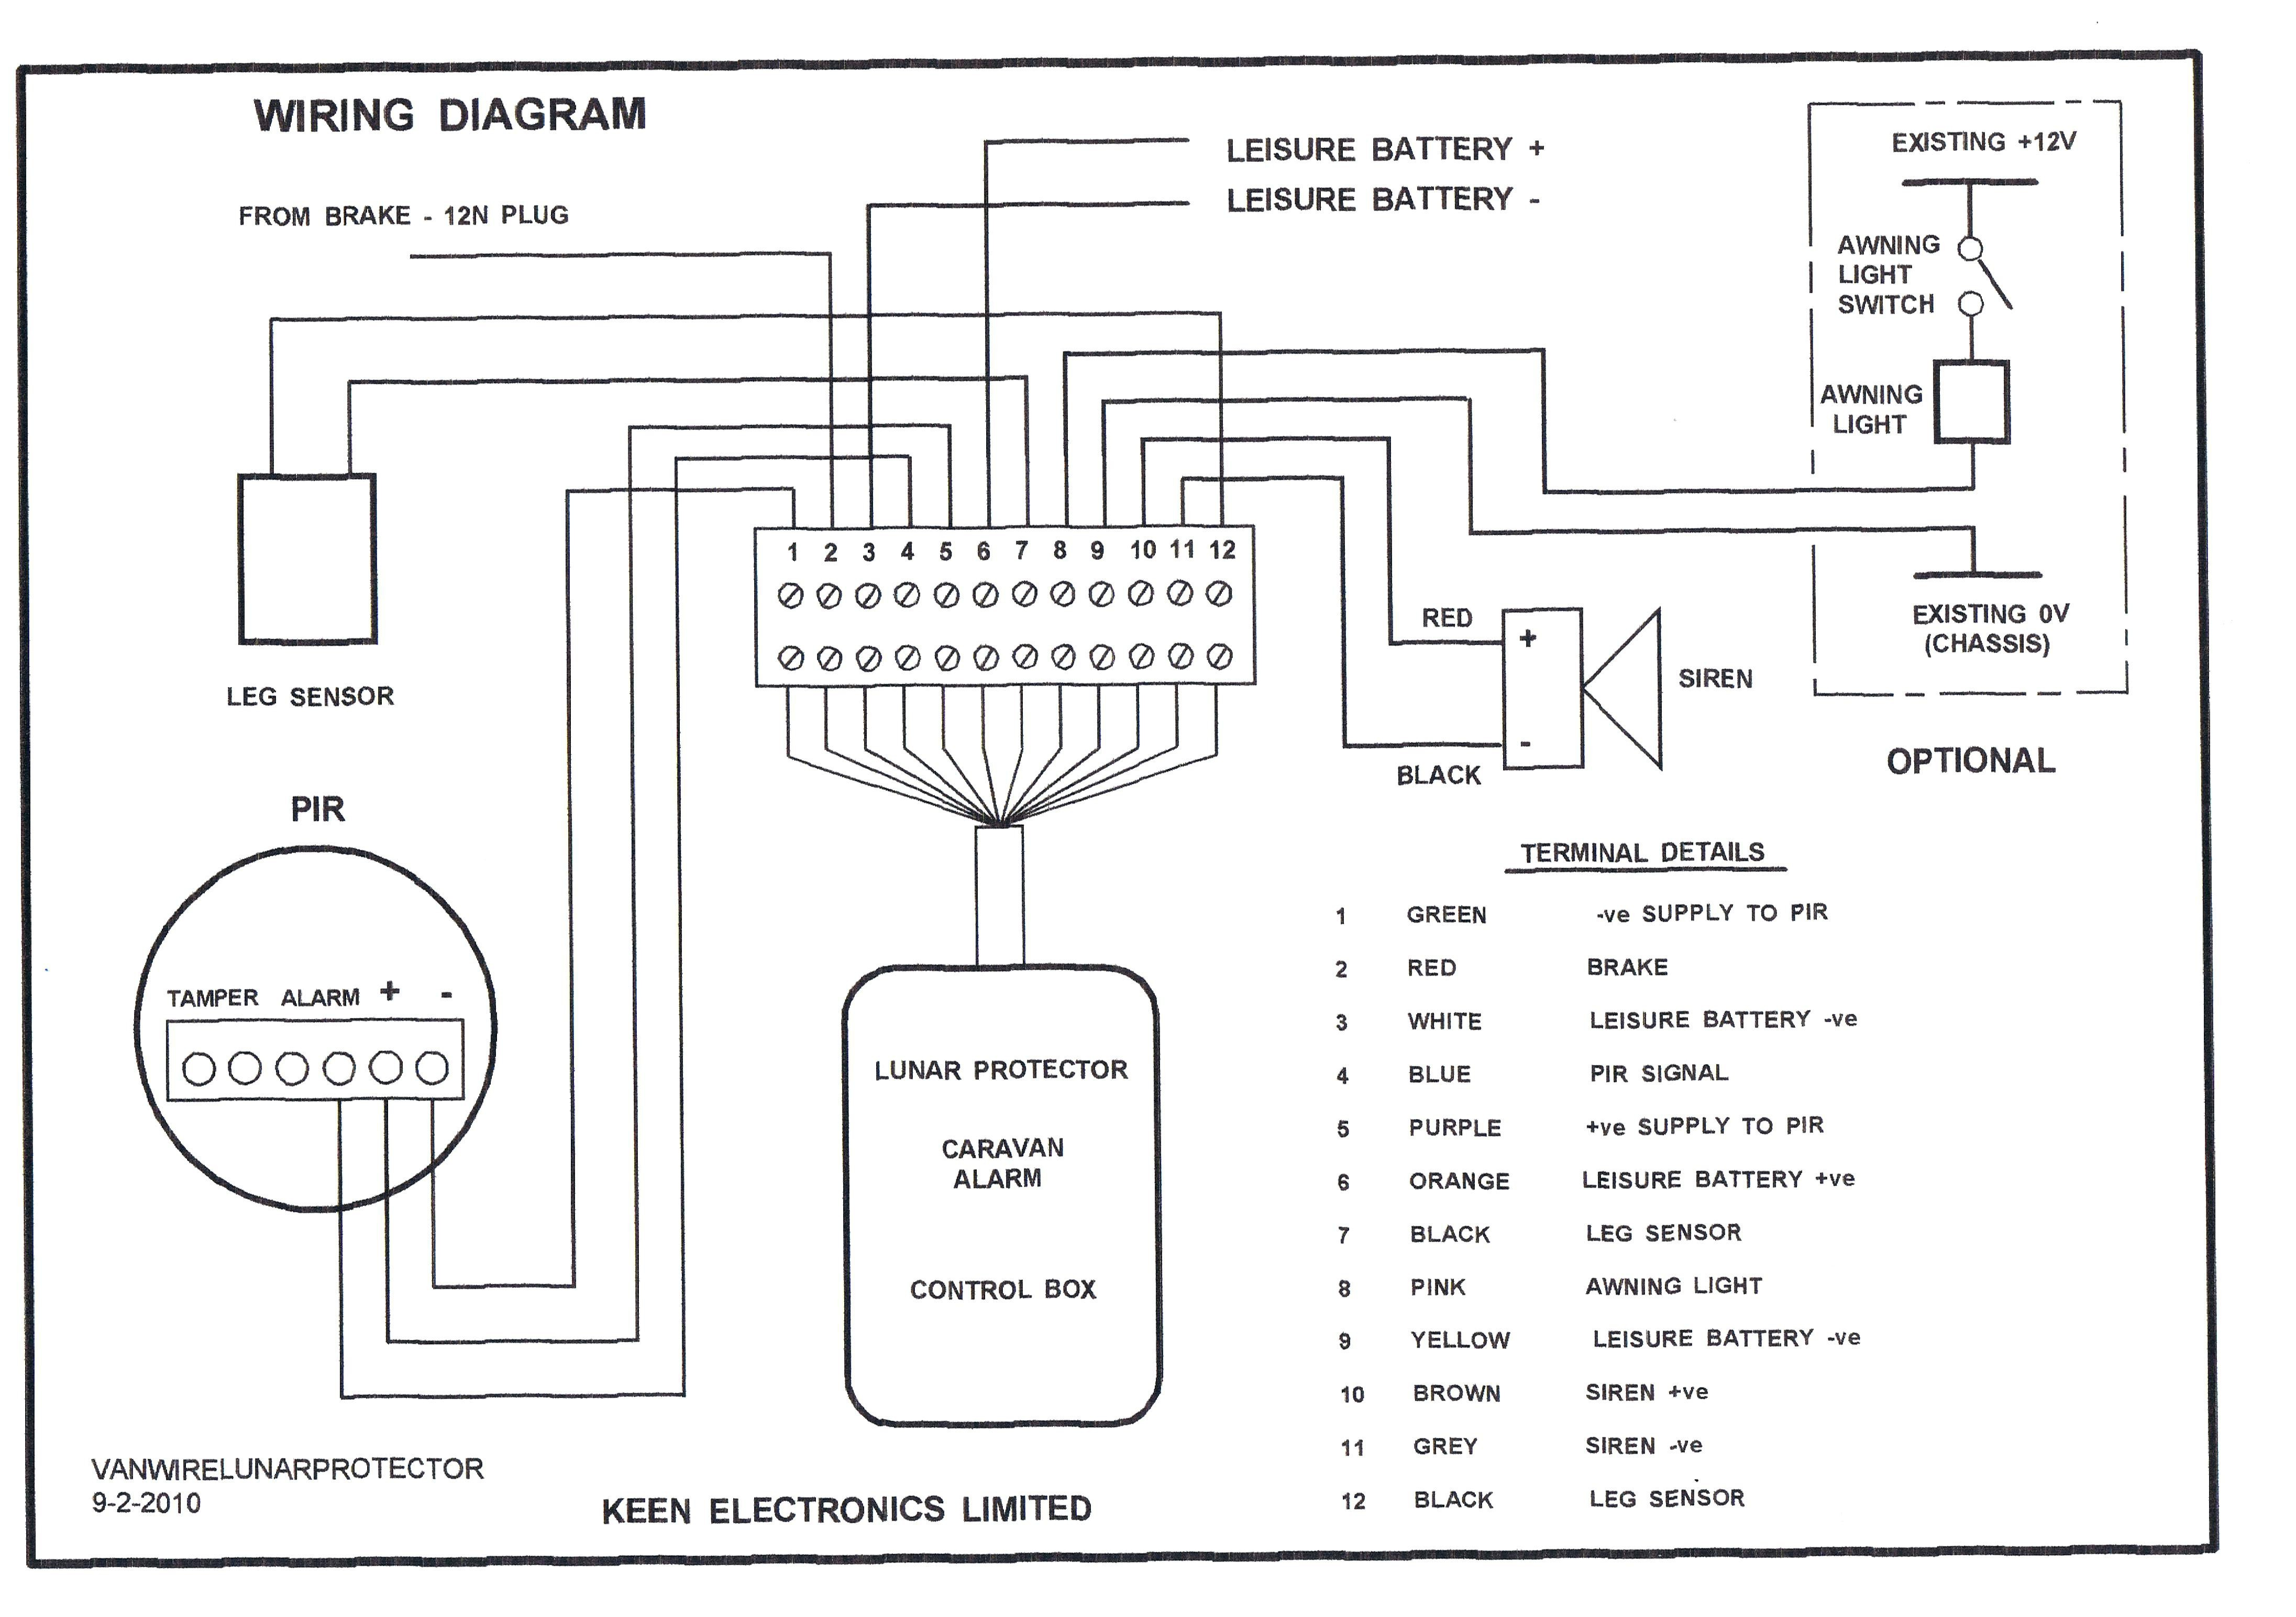 Fabulous Fire Alarm Wiring Diagram Pdf Valid Smoke Detector Inside At Fire Wiring Cloud Rineaidewilluminateatxorg